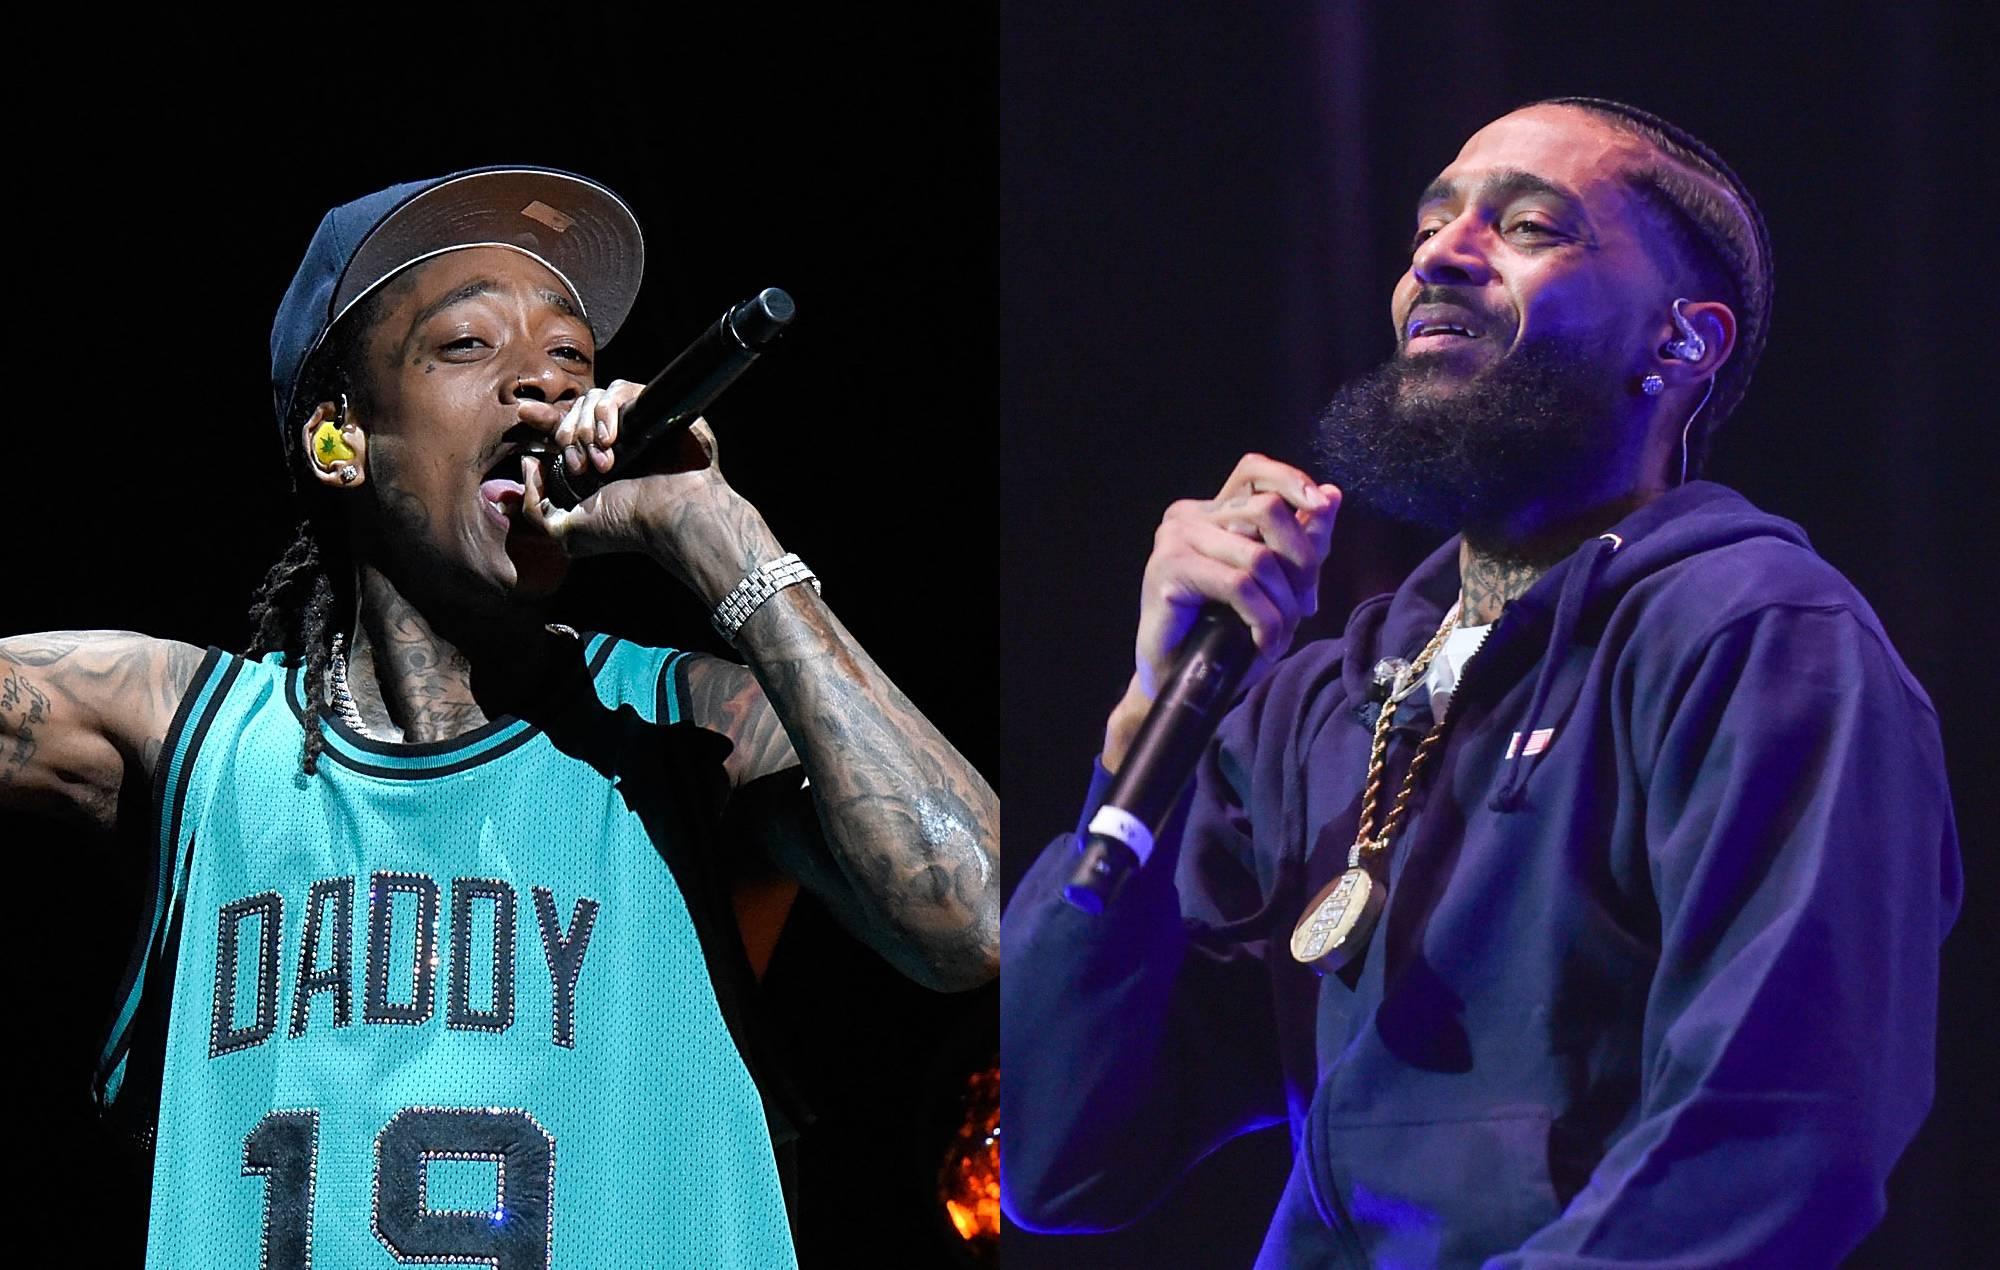 Wiz Khalifa shares unheard 'Hopes & Dreams' featuring Nipsey Hussle verse